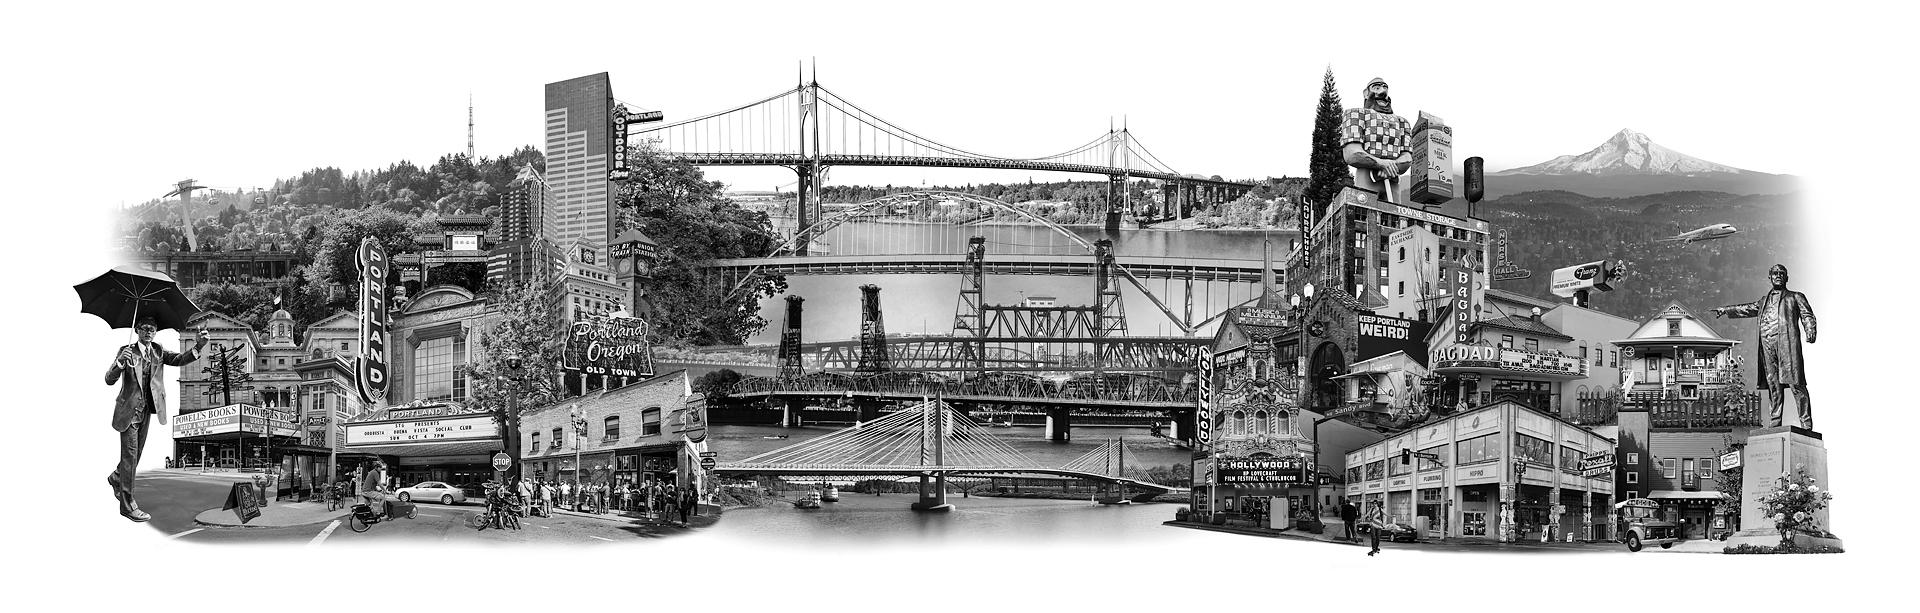 beth kerschen Portland East Meets West photomontage artwork